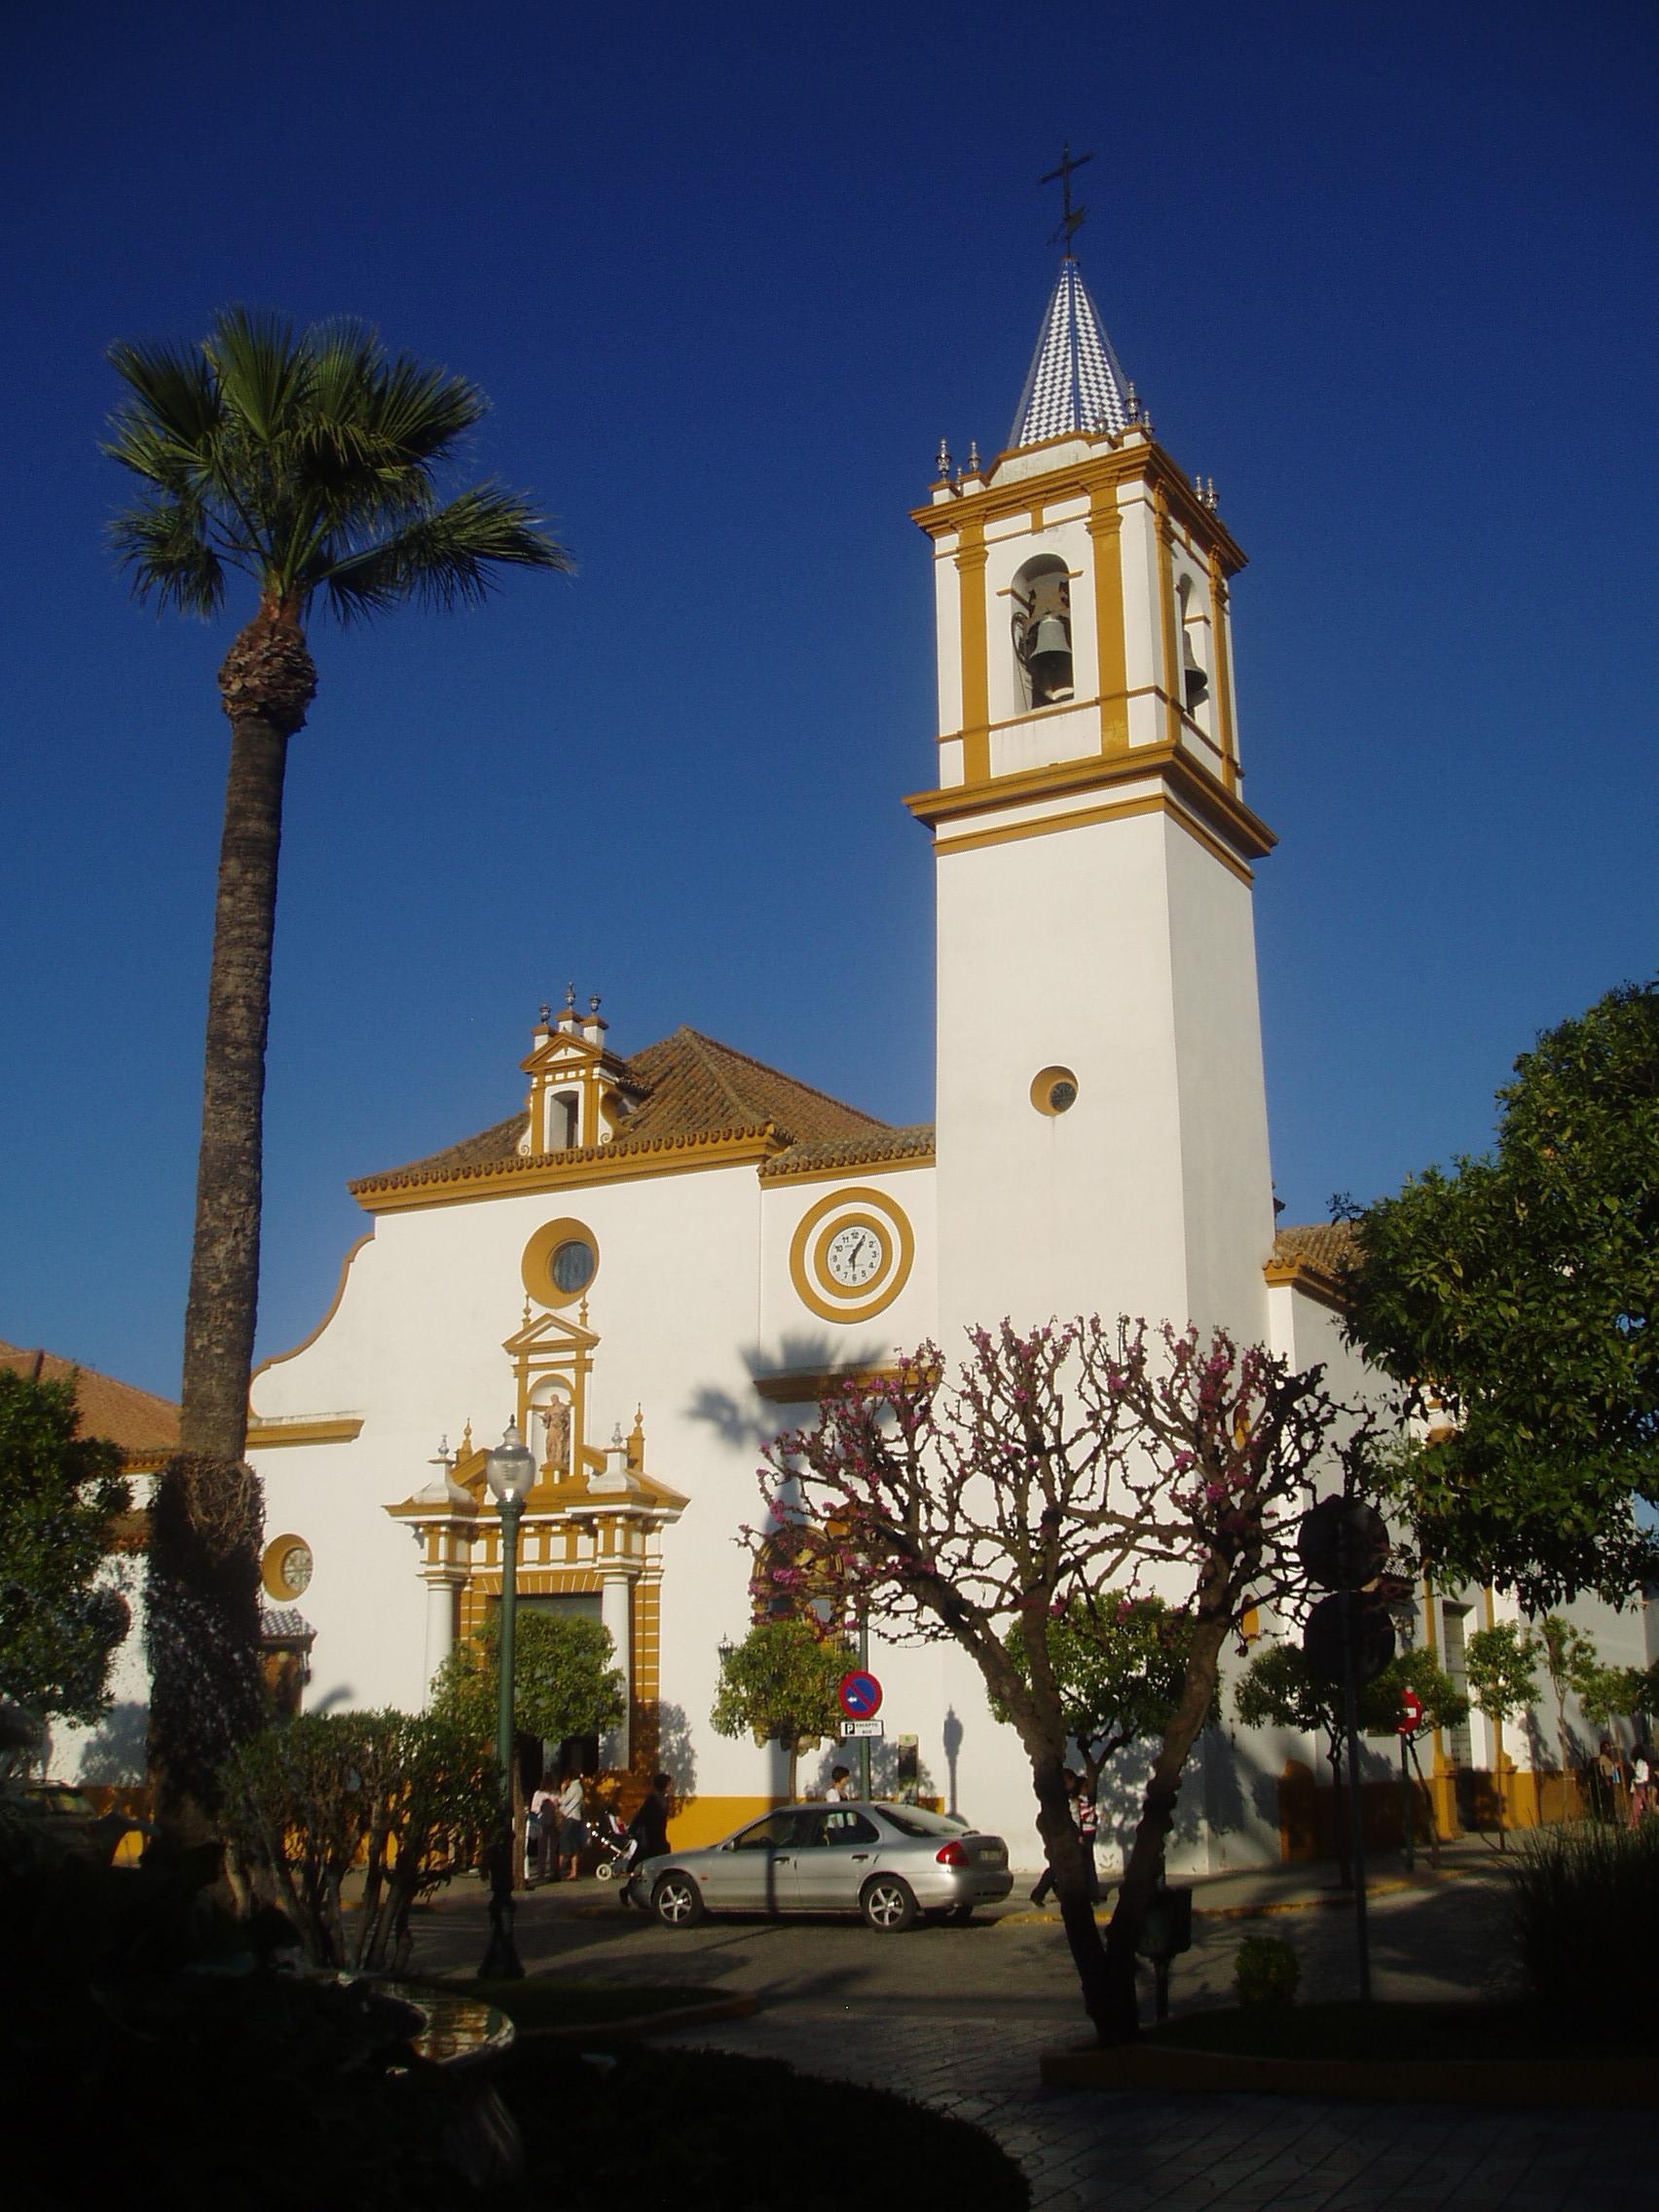 File parroquia dos hermanas d a jpg wikimedia commons - Lamparas dos hermanas ...